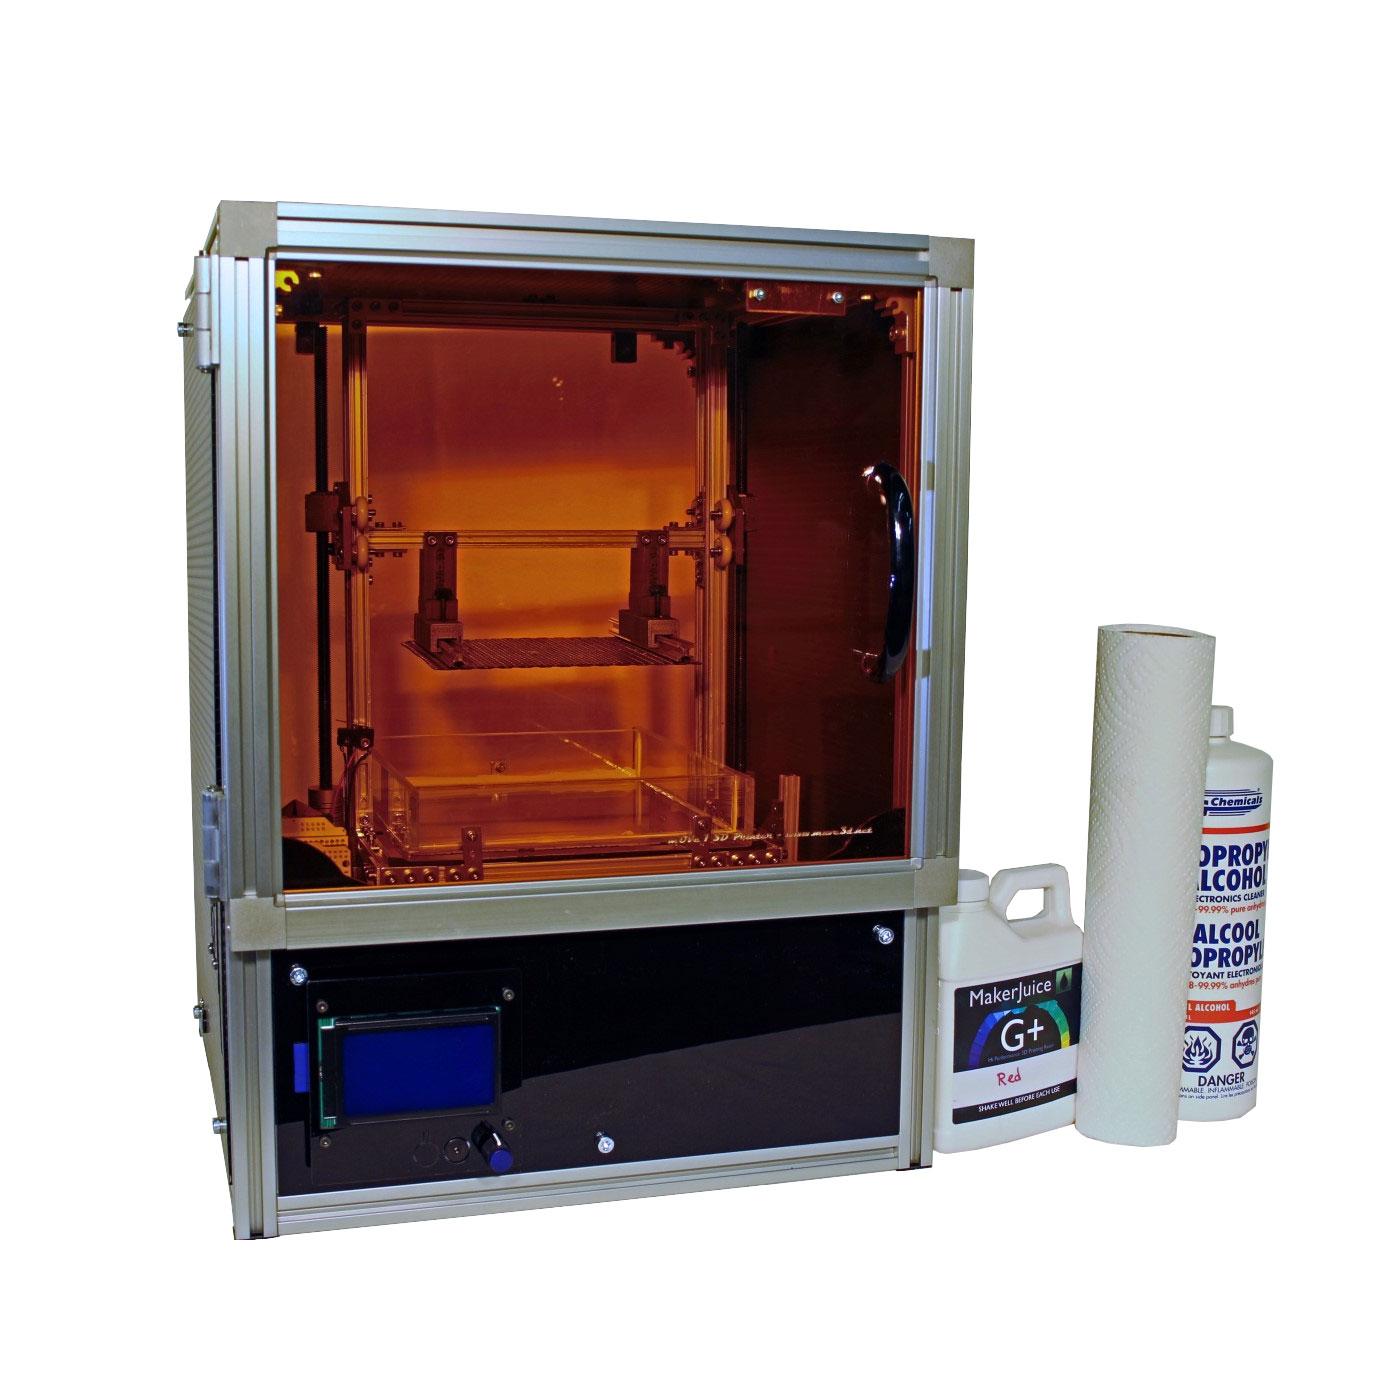 3D Printer mUVe 1